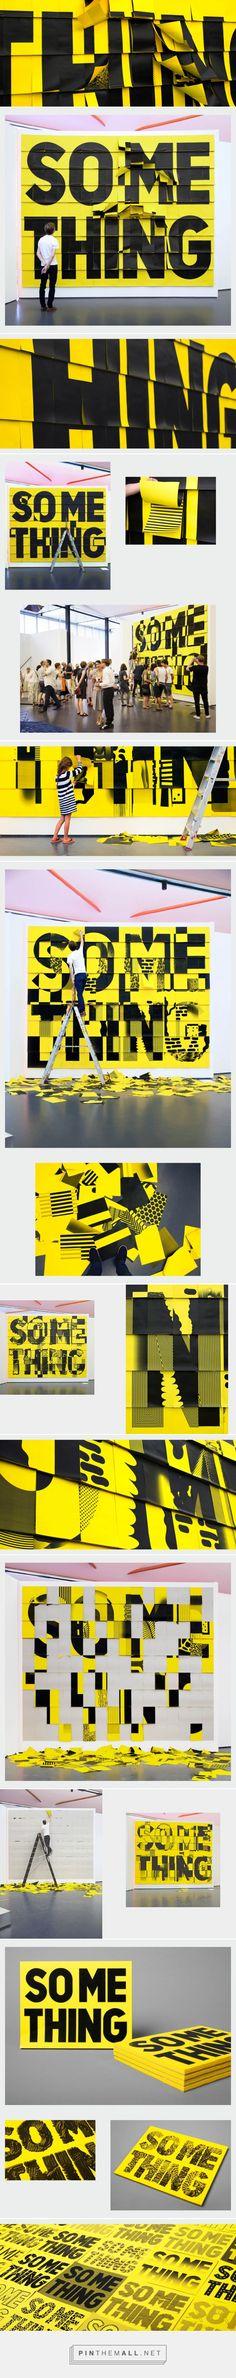 So Me Thing Kunsthal - Studio Spass